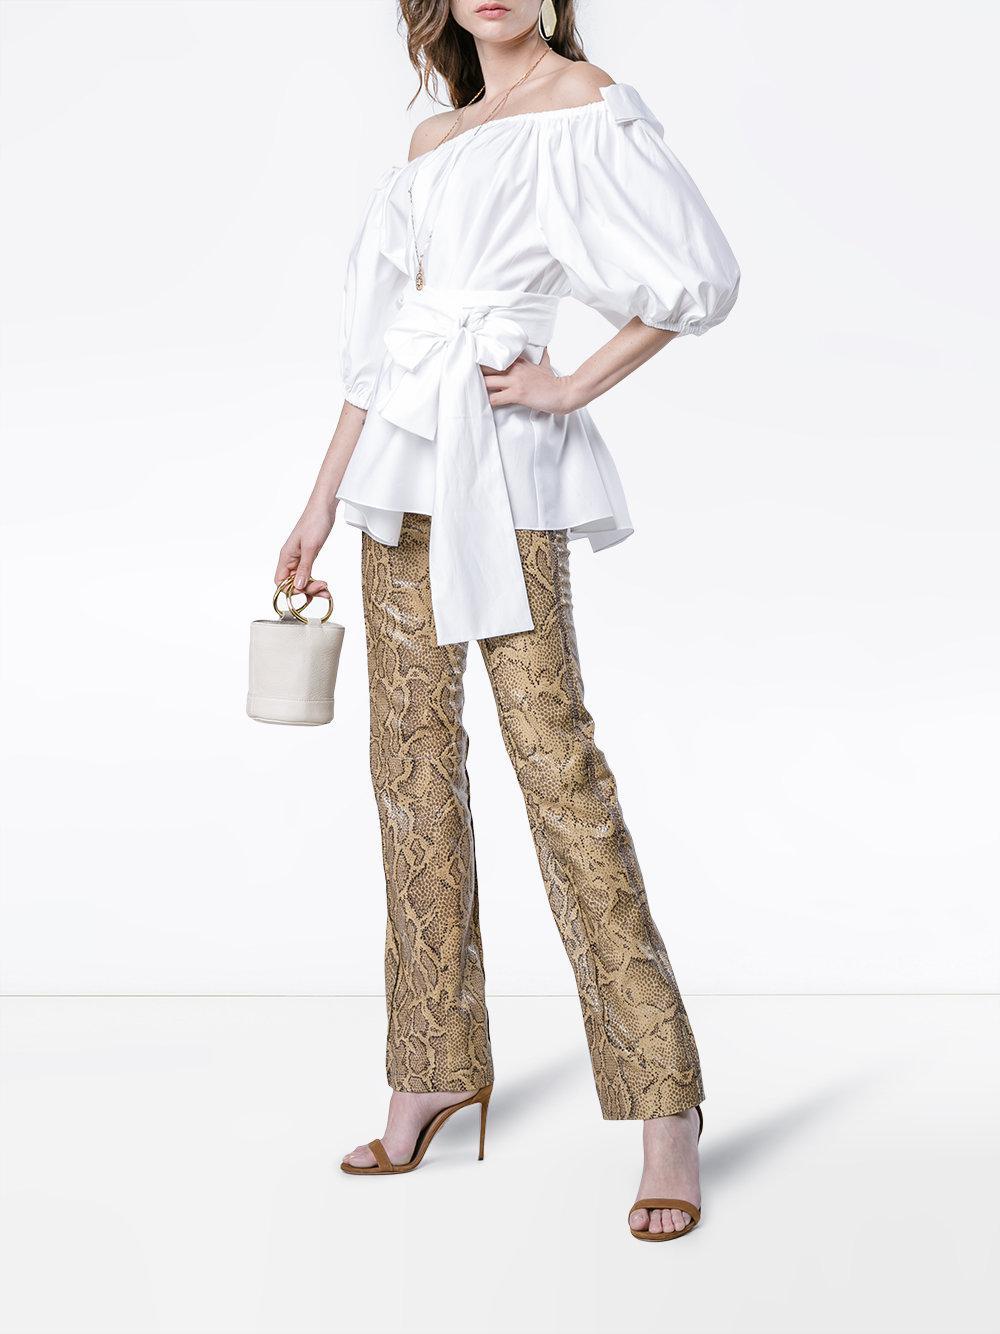 6eca3be593b123 Stella McCartney Michelle Taffeta Top in White - Save 42% - Lyst